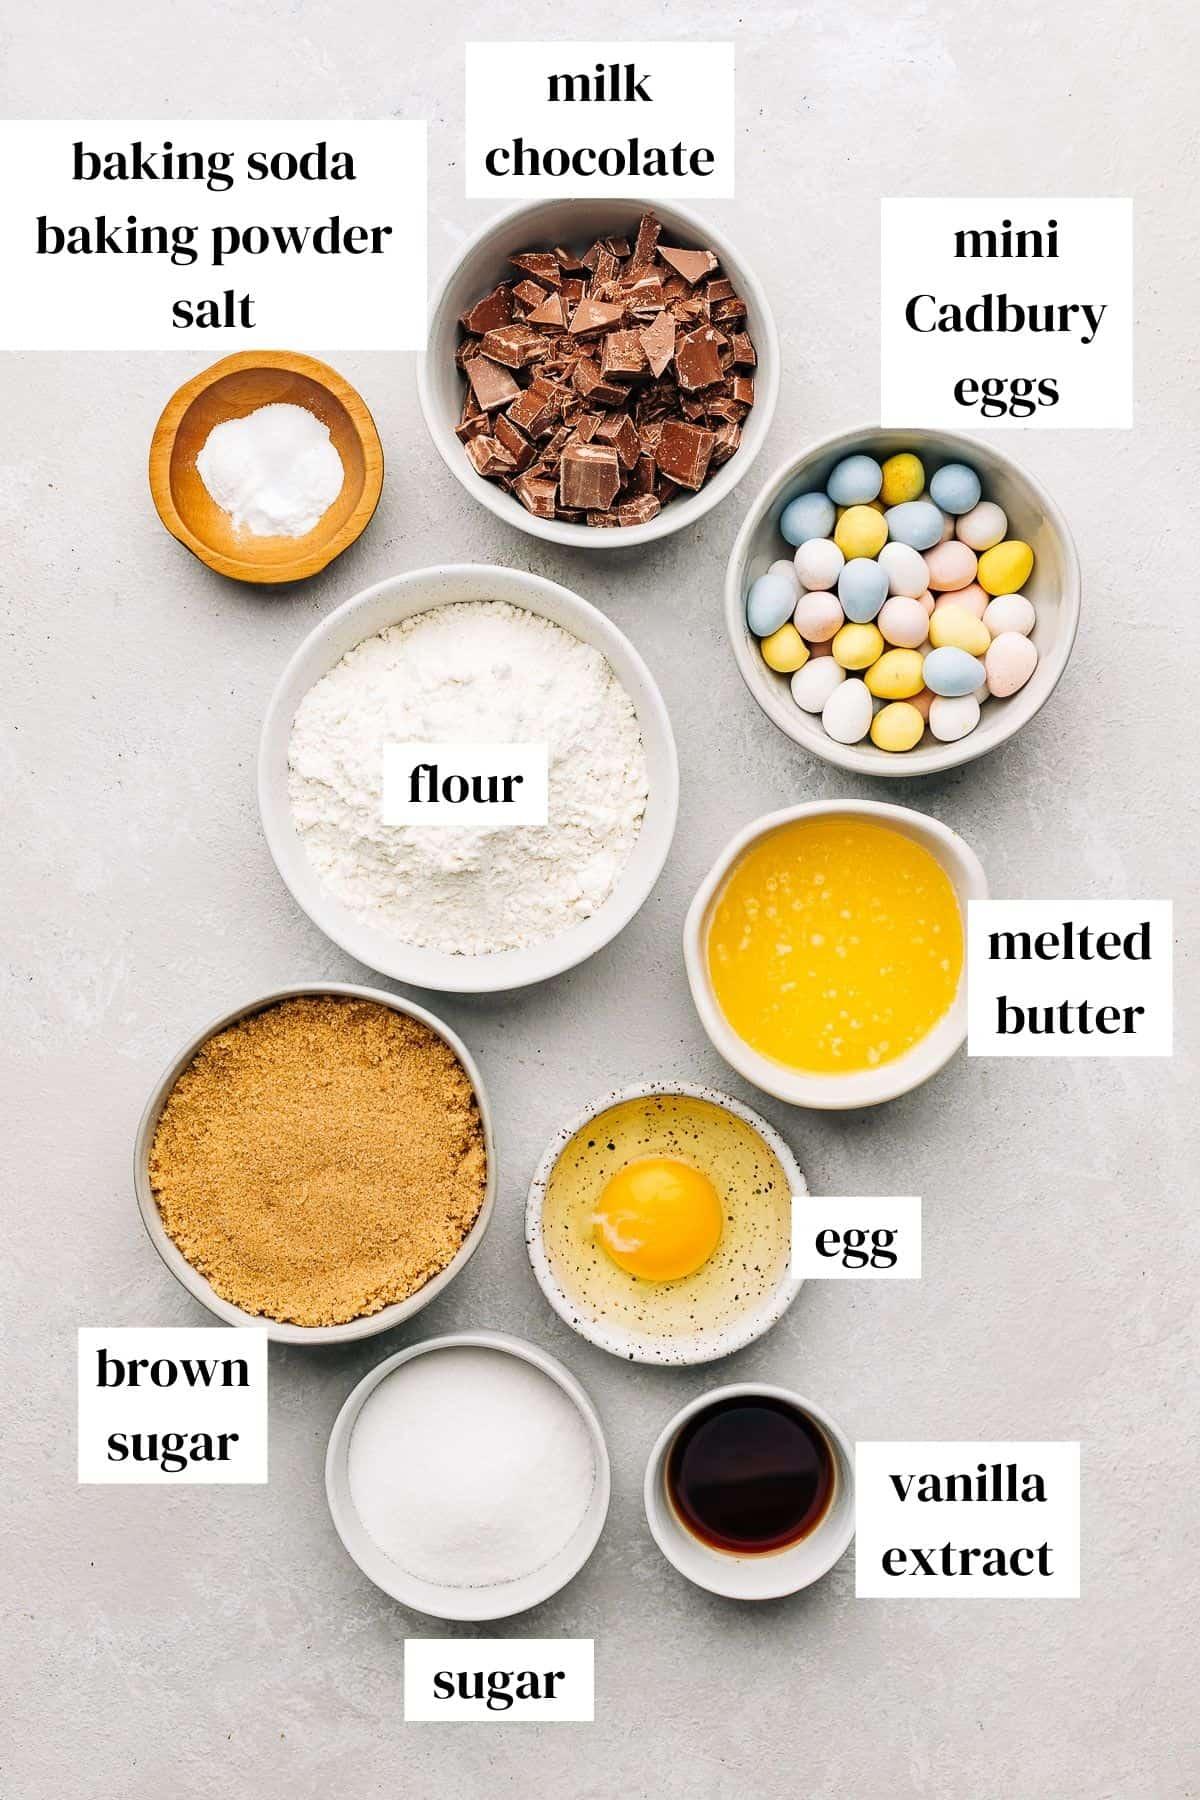 milk chocolate, cadbury mini eggs, melted butter, egg, vanilla extract, sugar, brown sugar, flour, baking powder, baking soda, salt on a gray surface.